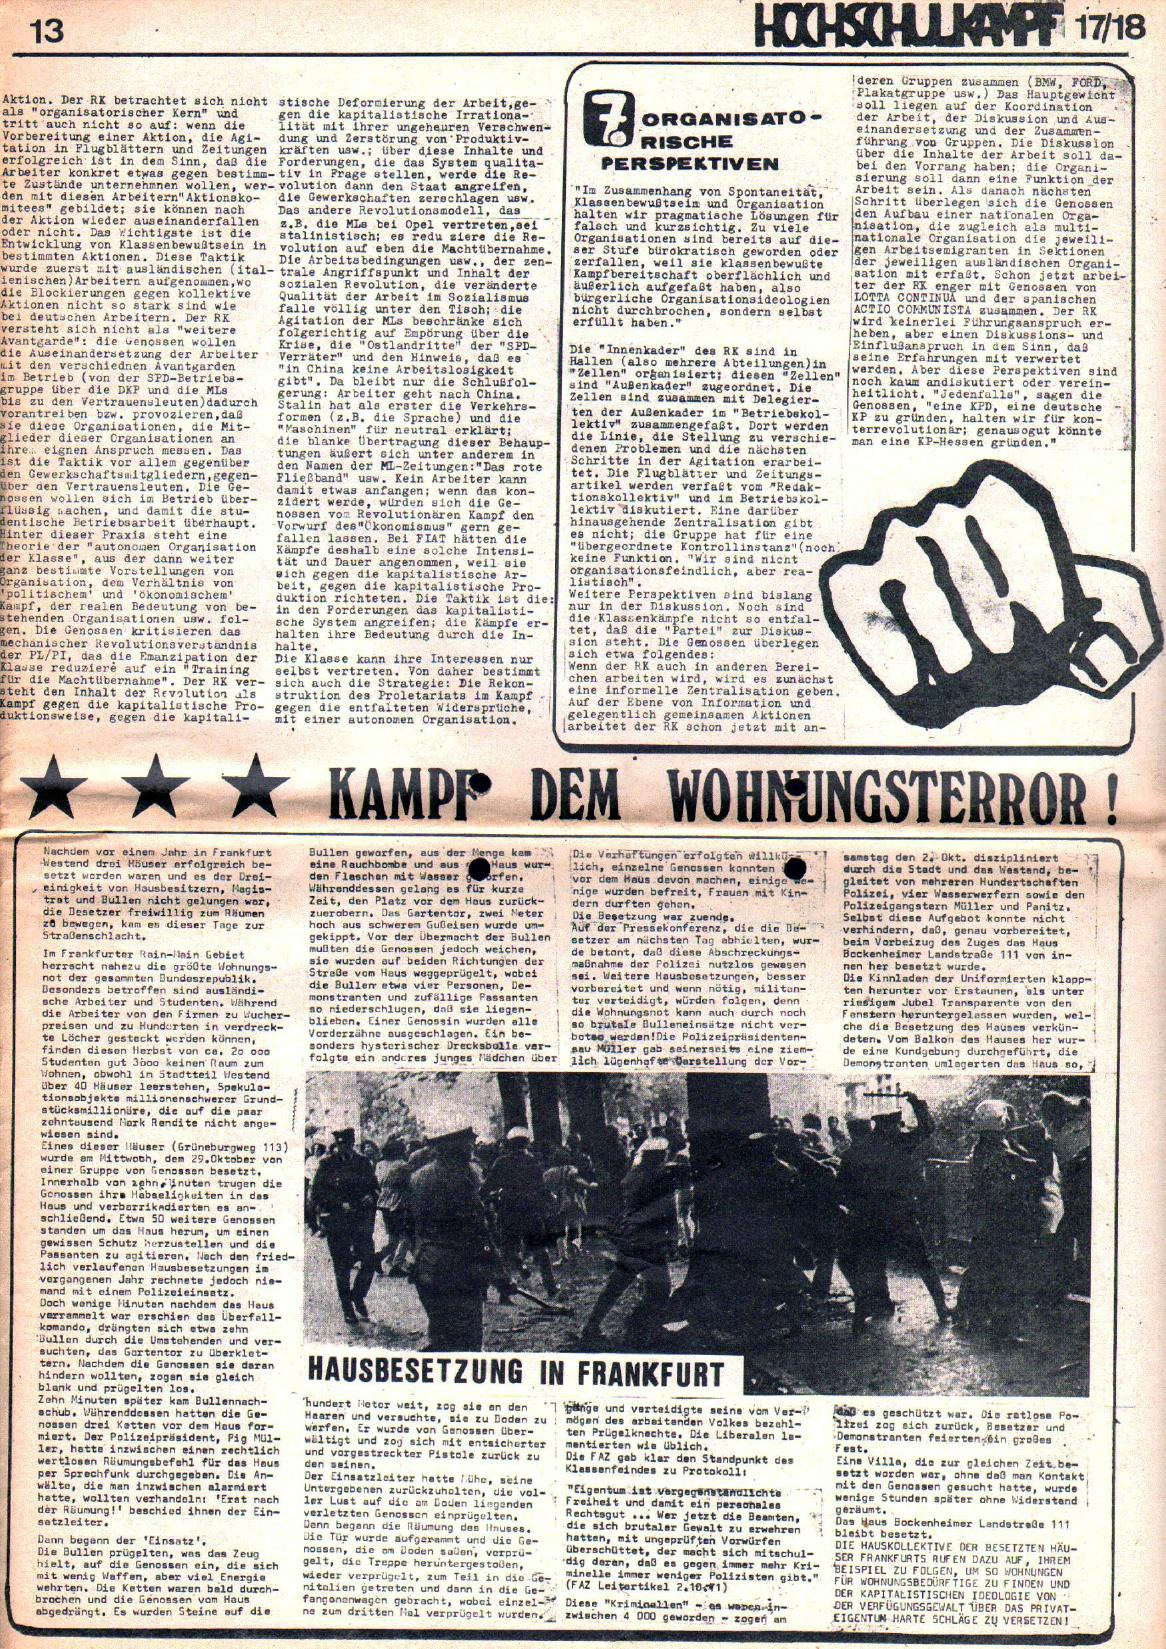 Berlin_Hochschulkampf_1971_17_13